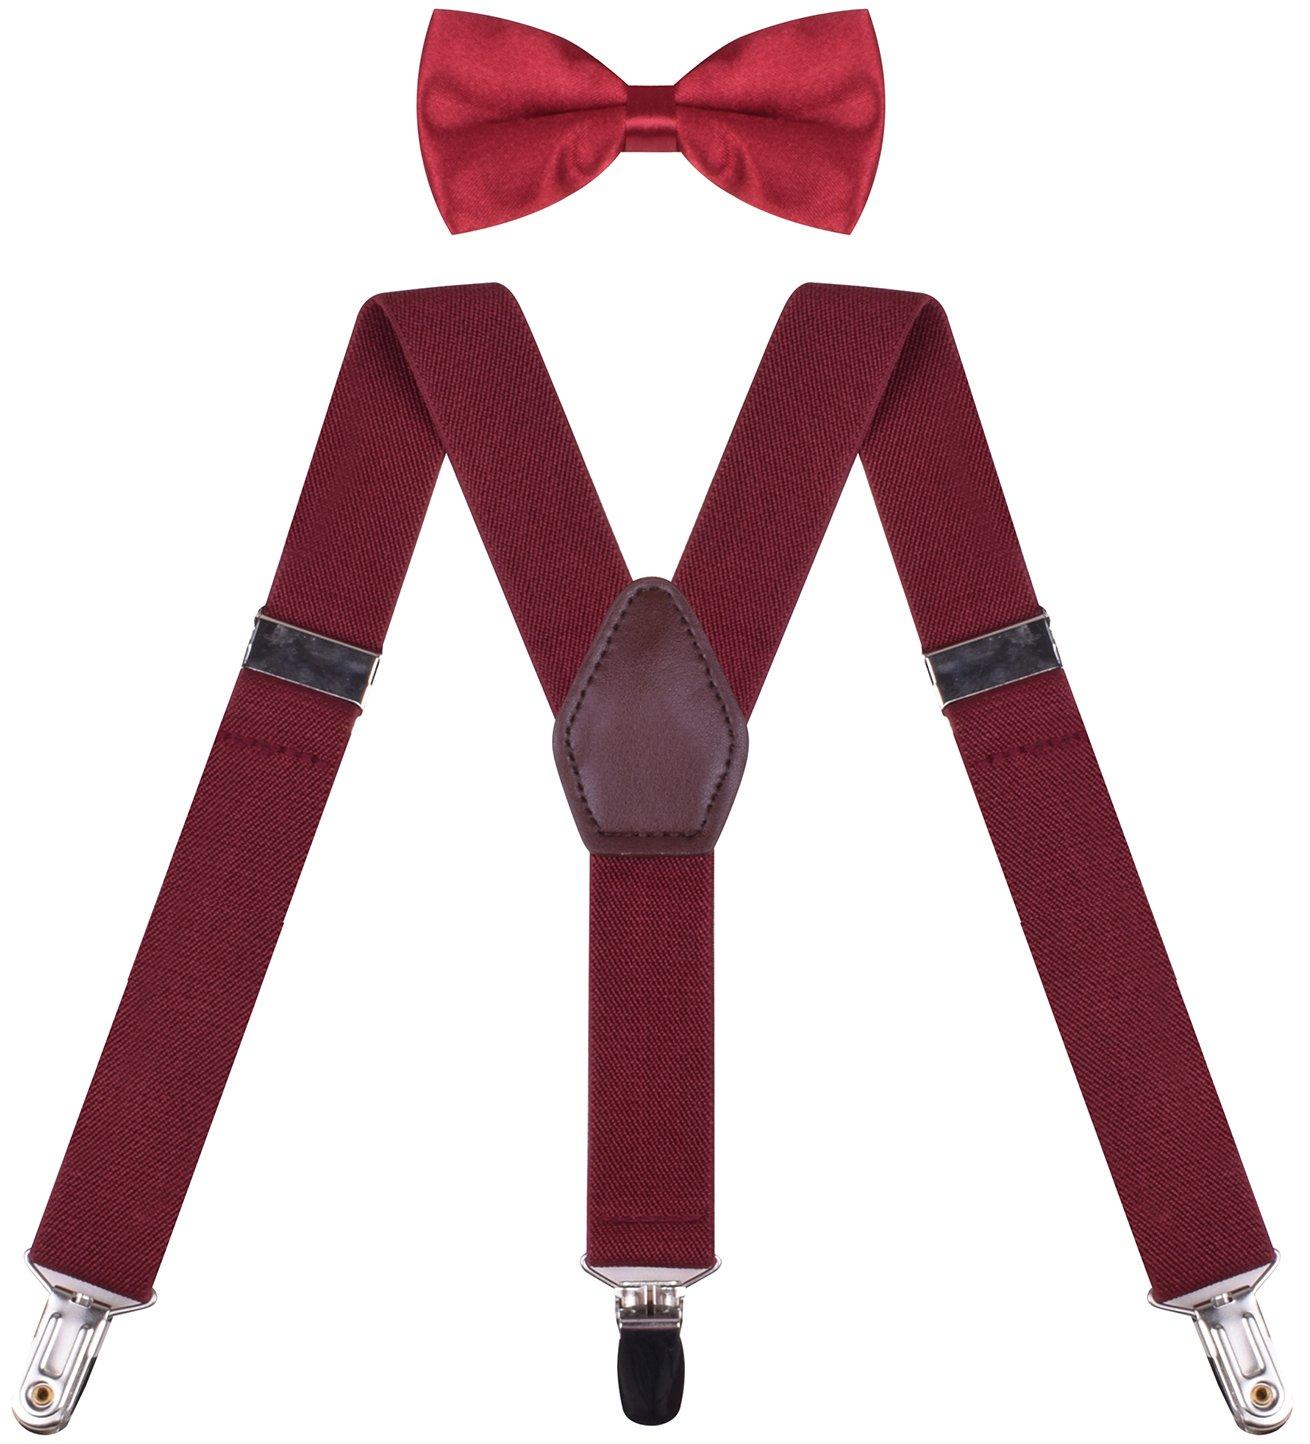 Suspenders With Bow Tie Fashion Suspender Braces for Kids Shoulder Straps Wine